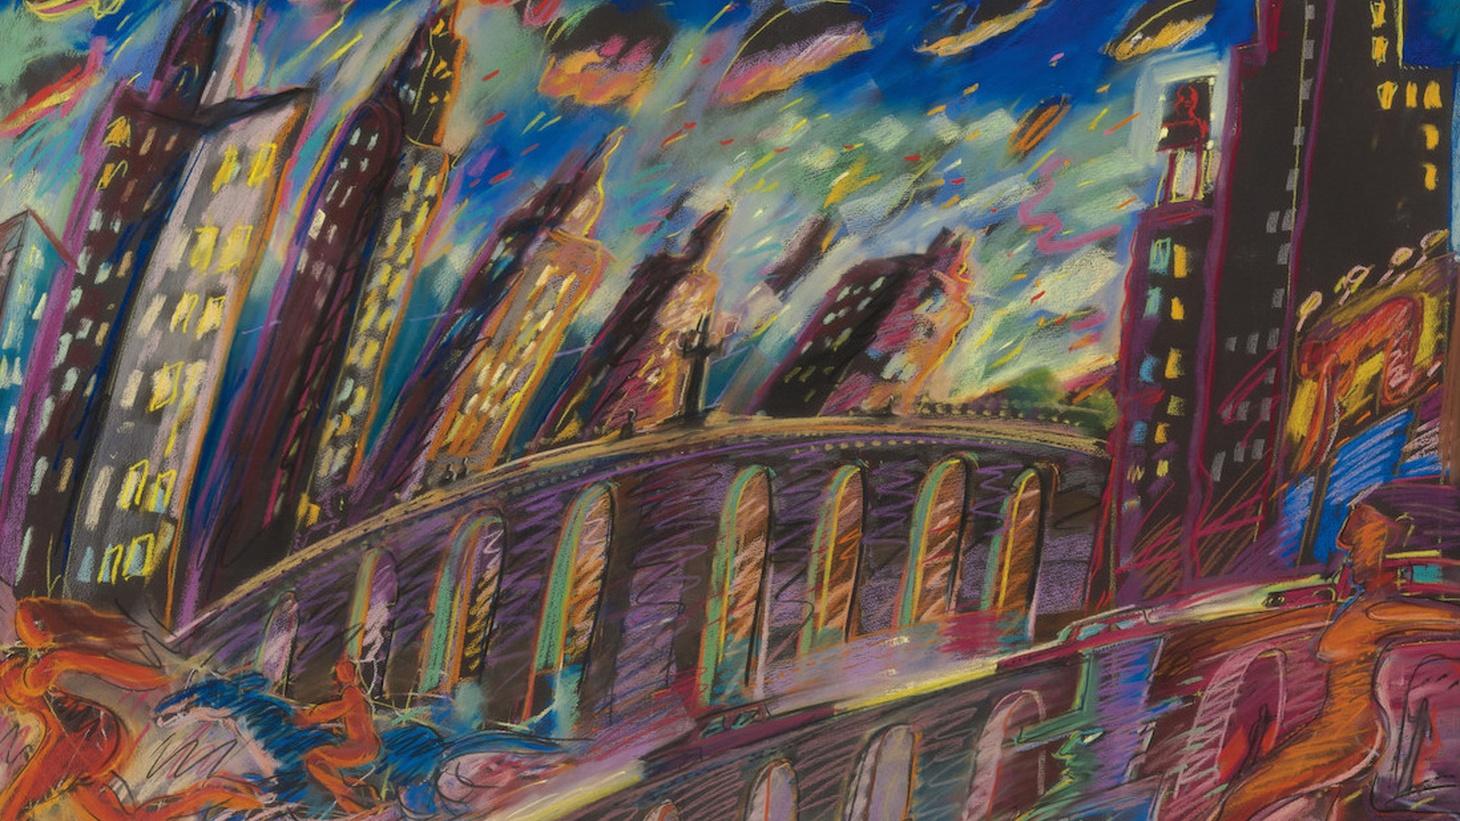 Edward Goldman talks about the long overdue retrospective of Chicano artist Carlos Almaraz at LACMA.